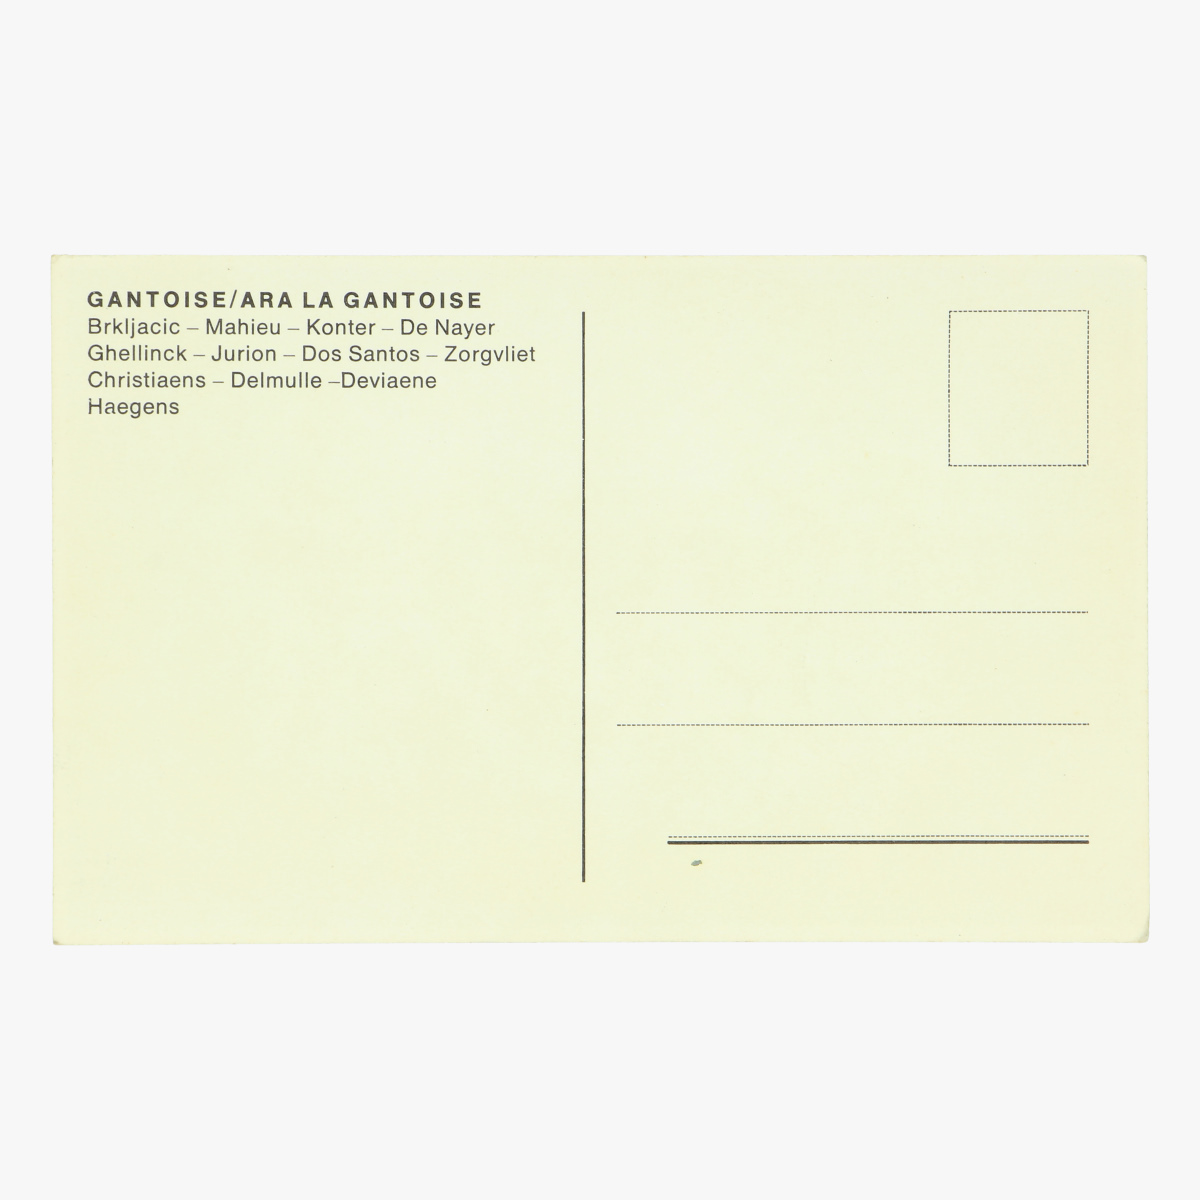 Afbeeldingen van oude postkaart voetbal gantoise / ara la gantoise